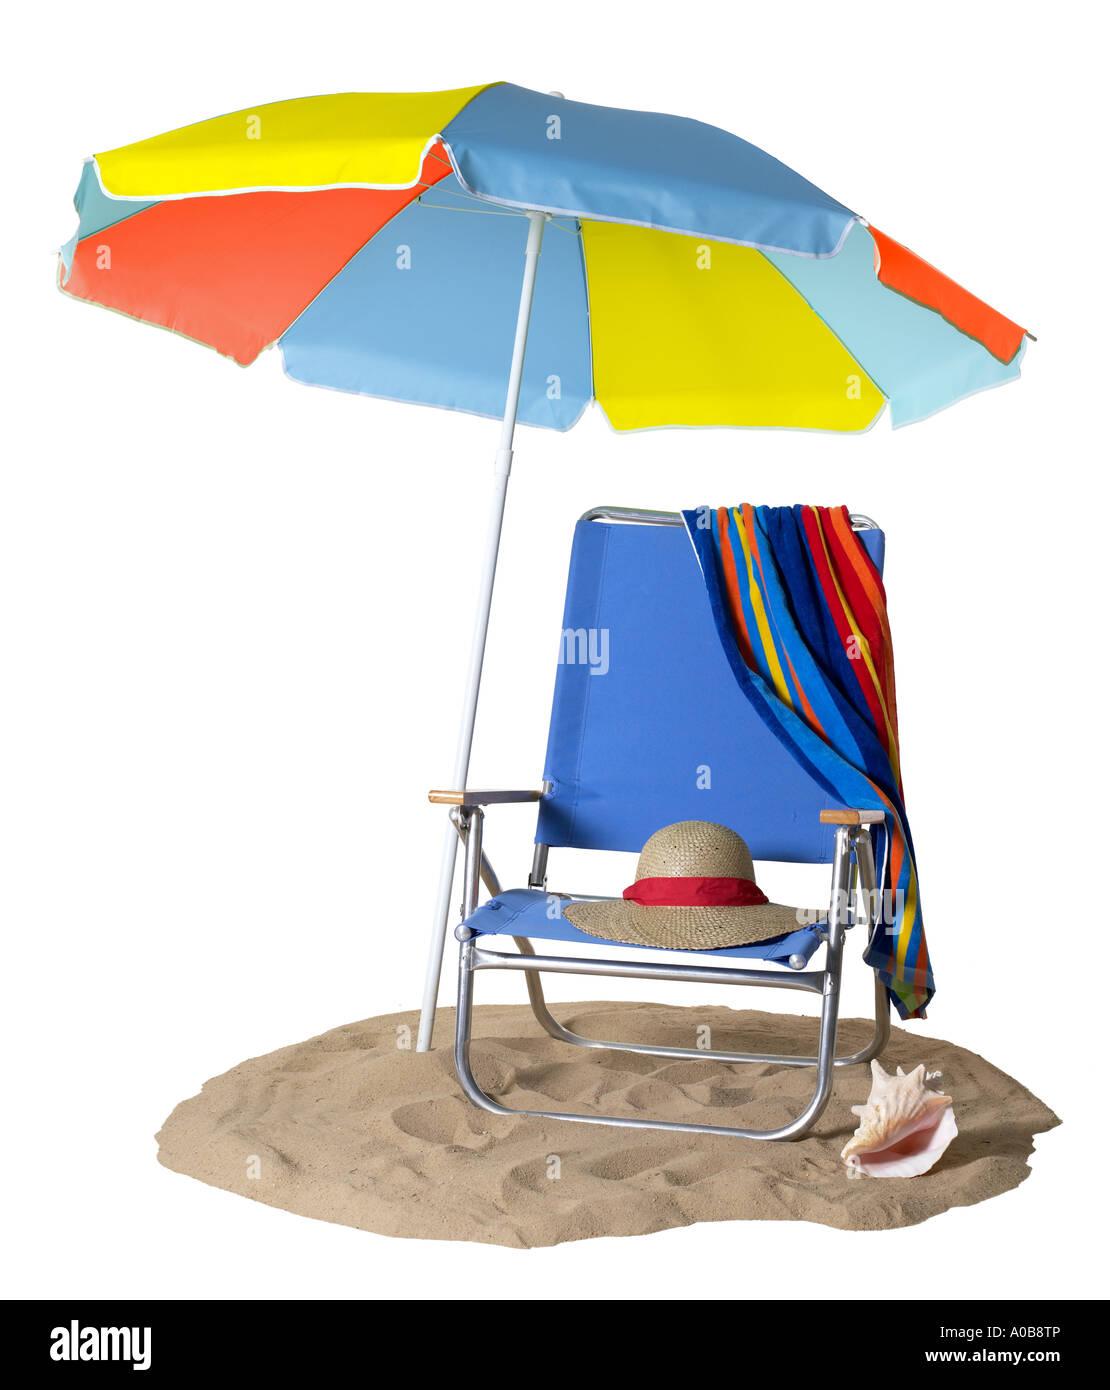 image free chair beach umbrella vector royalty